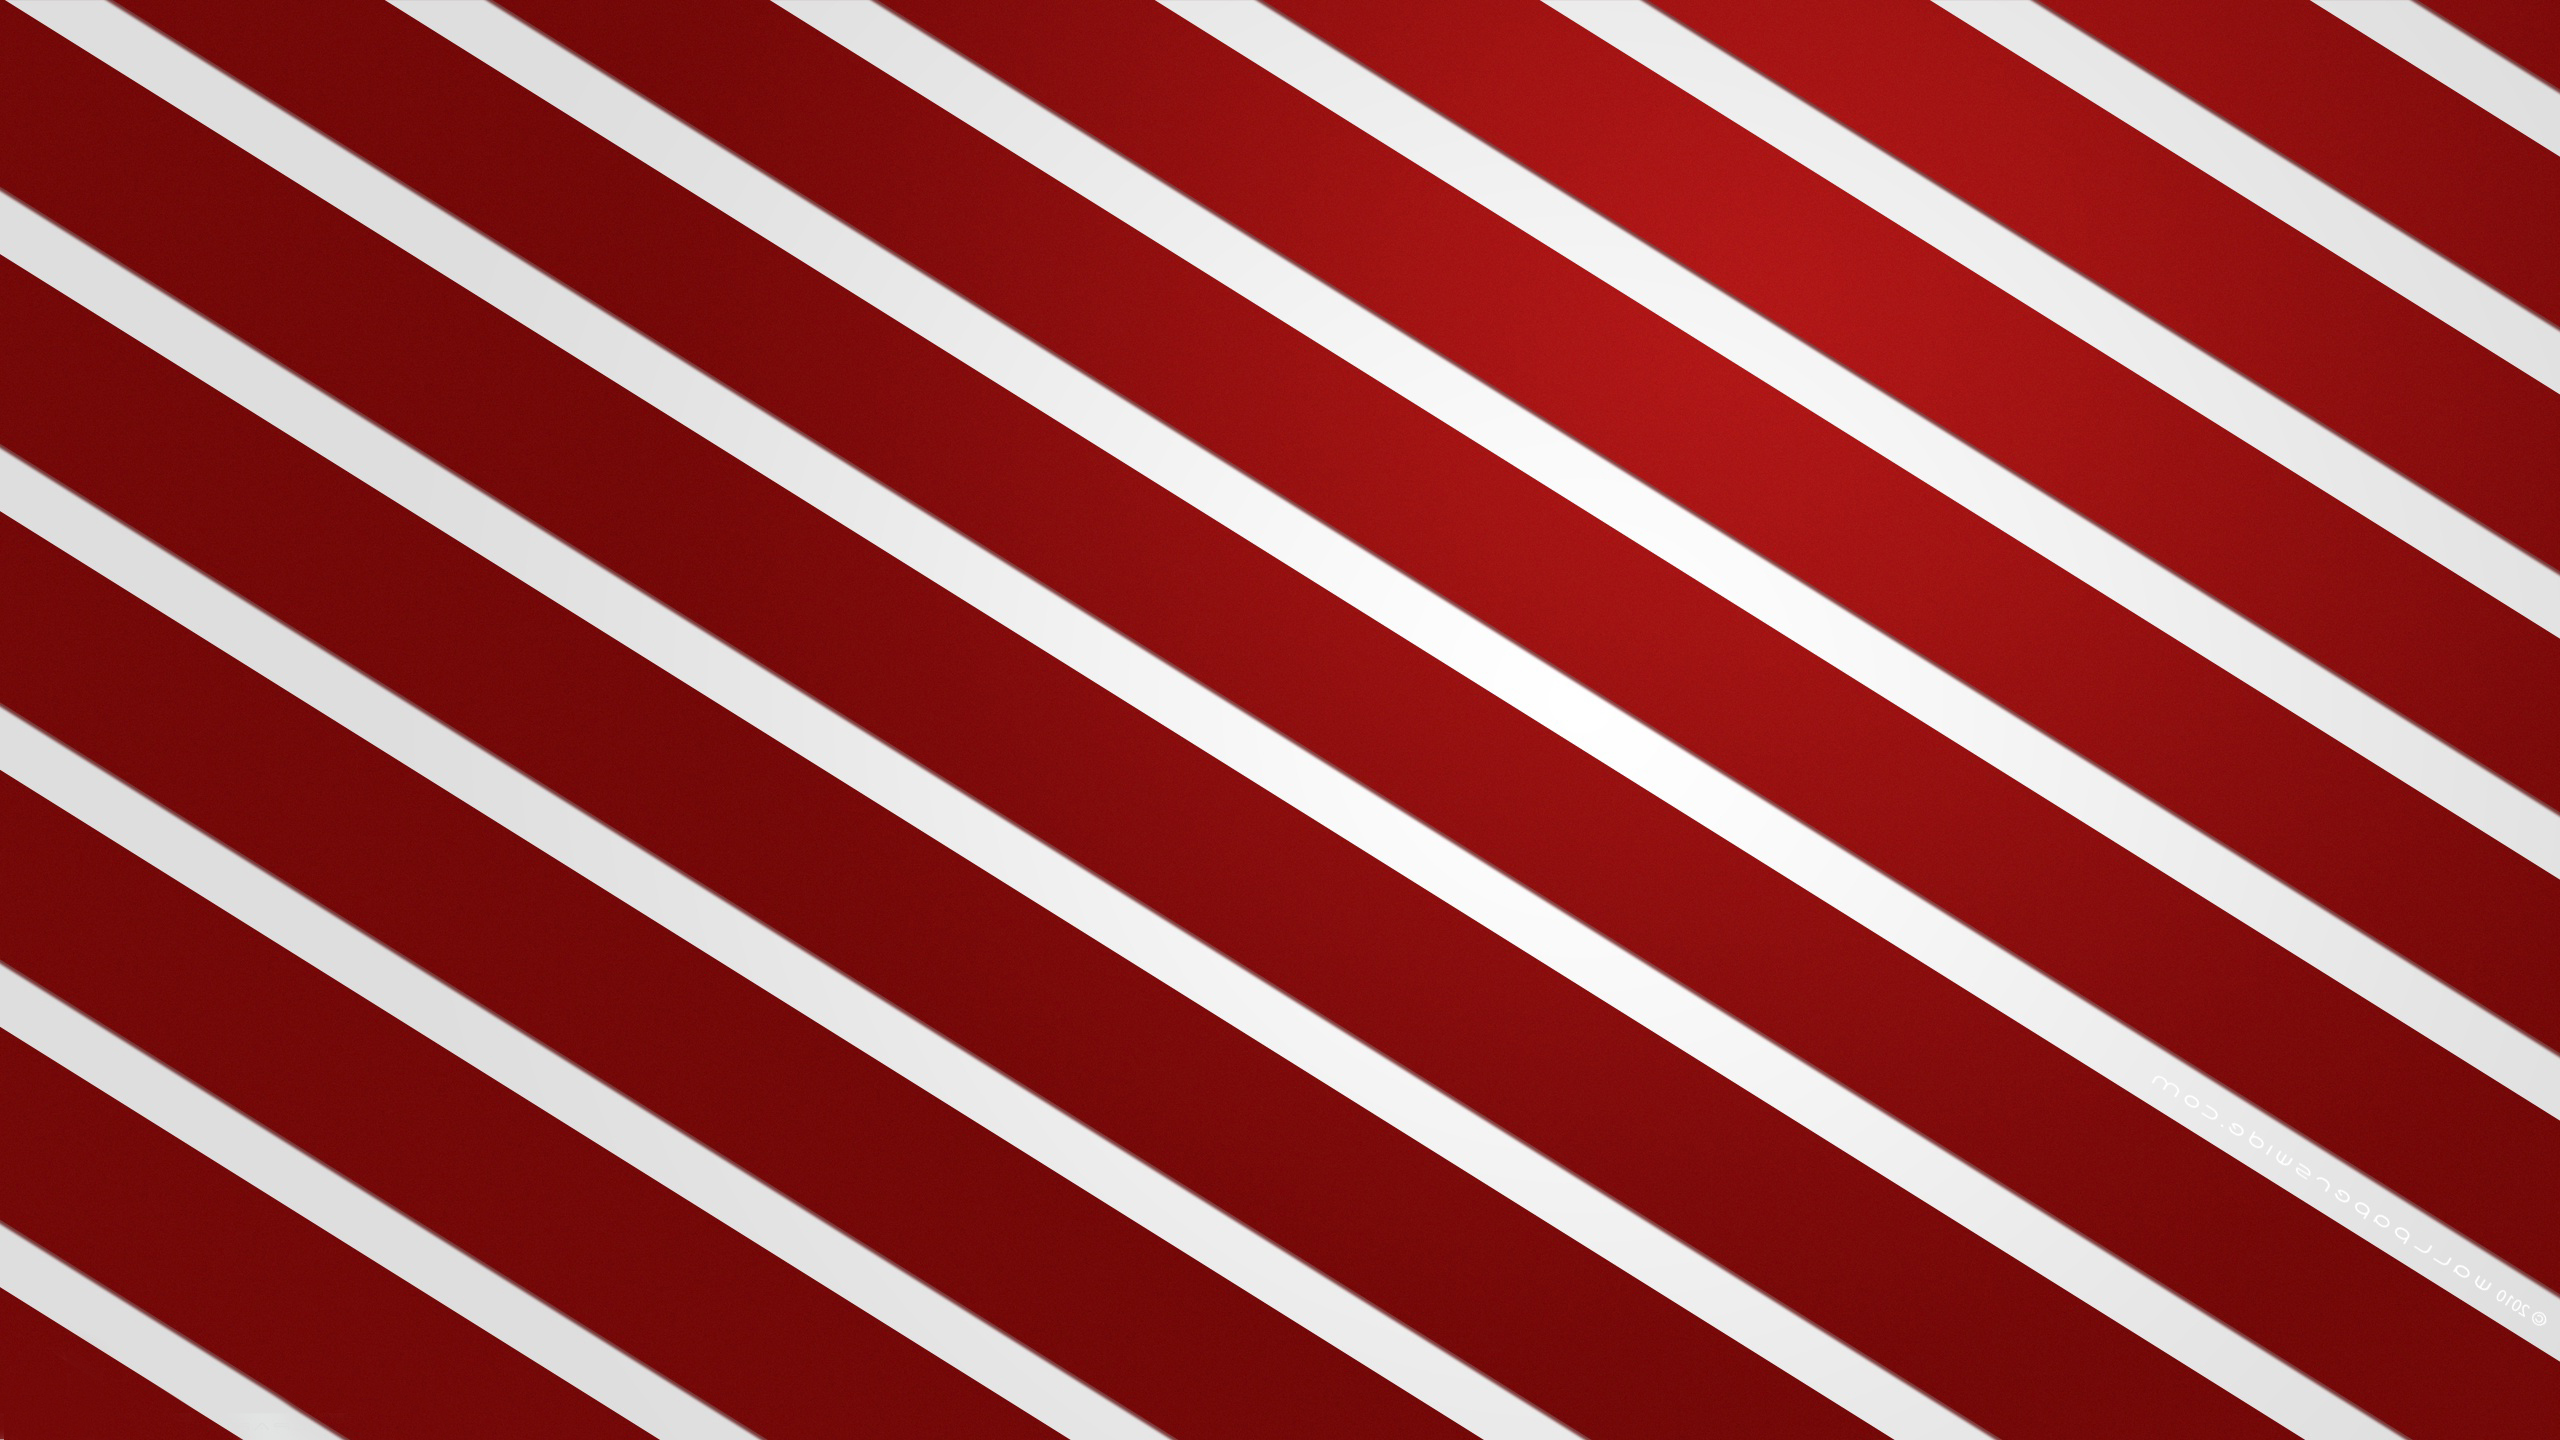 Muster - Andere  Hintergrundbild